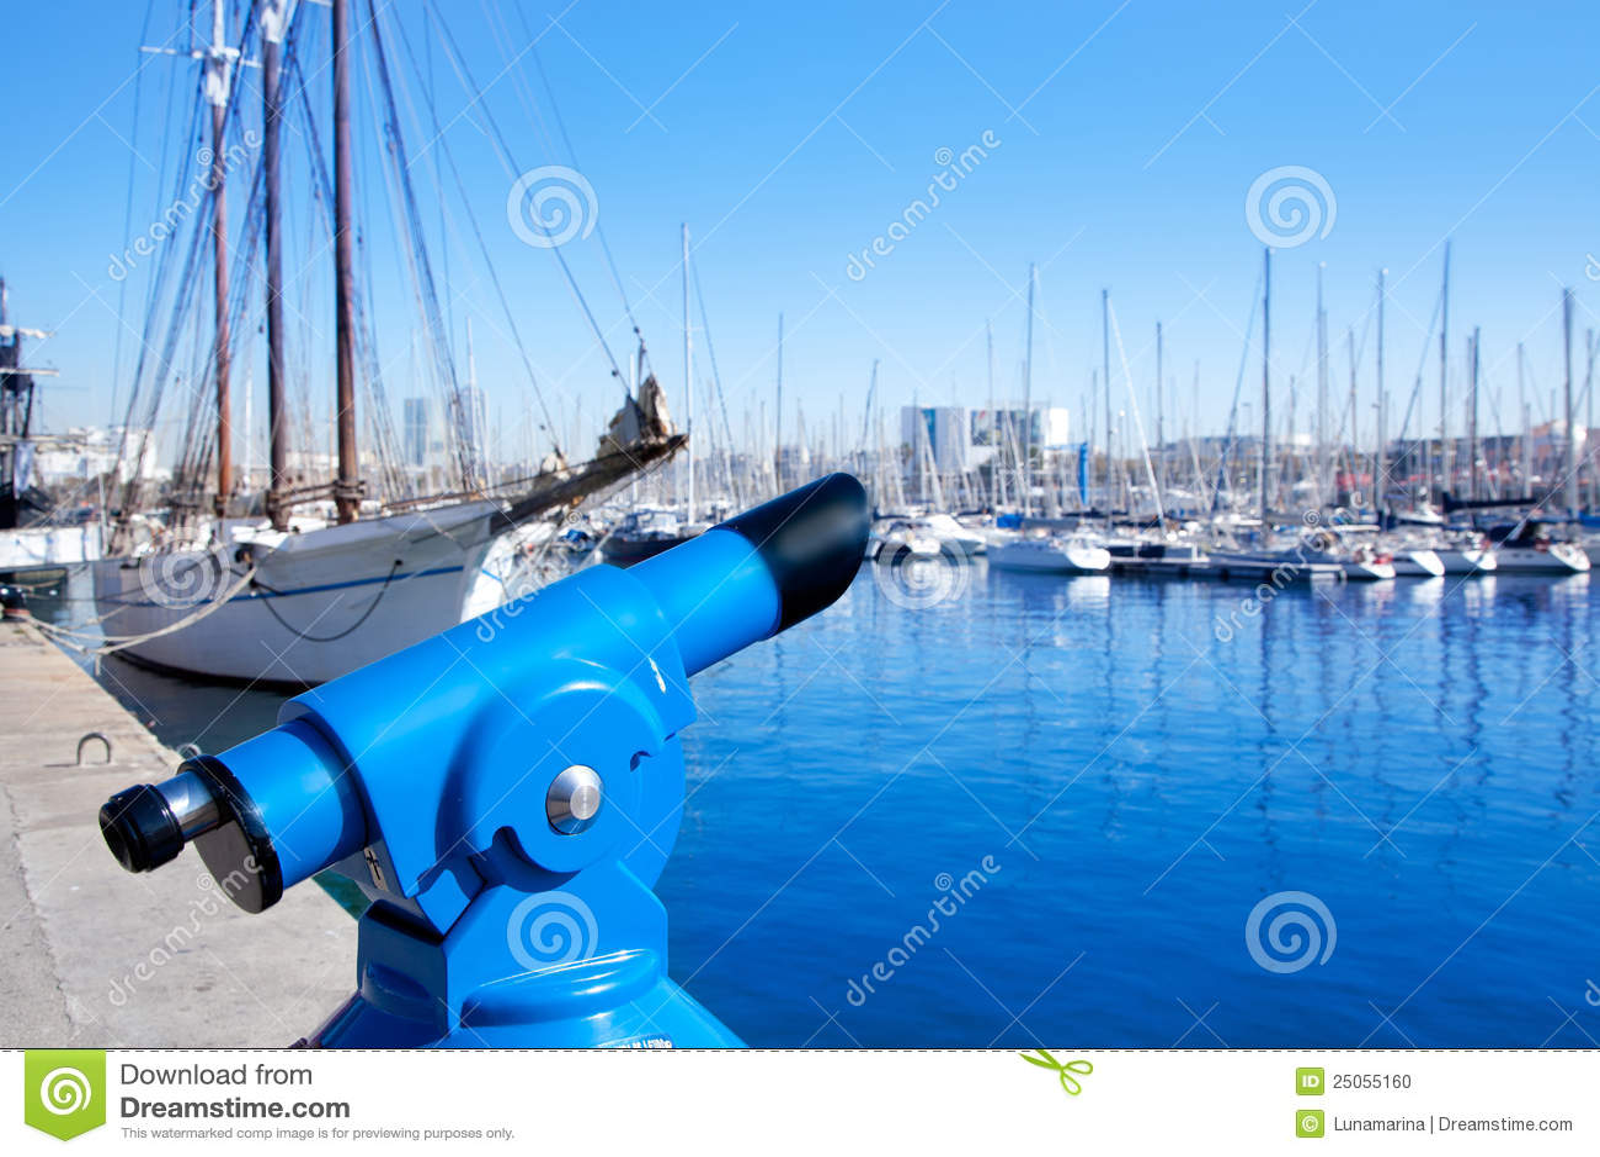 Barcelona port marina with blue telescope